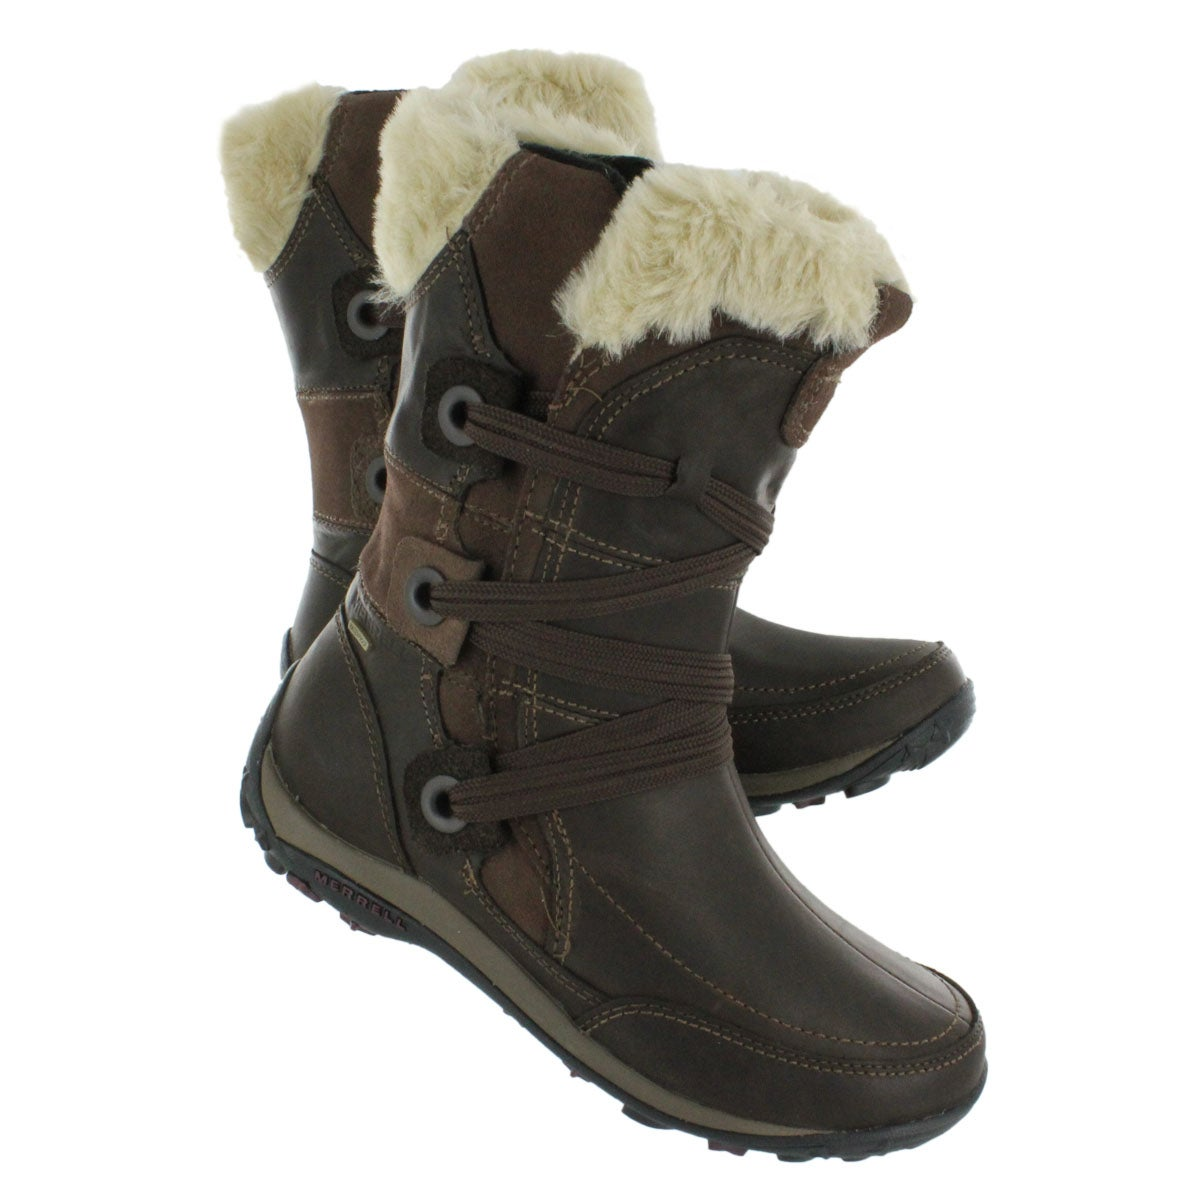 Simple Shoes  Women39s Boots Amp Shoes  Winter Amp Snow Boots  Women39s